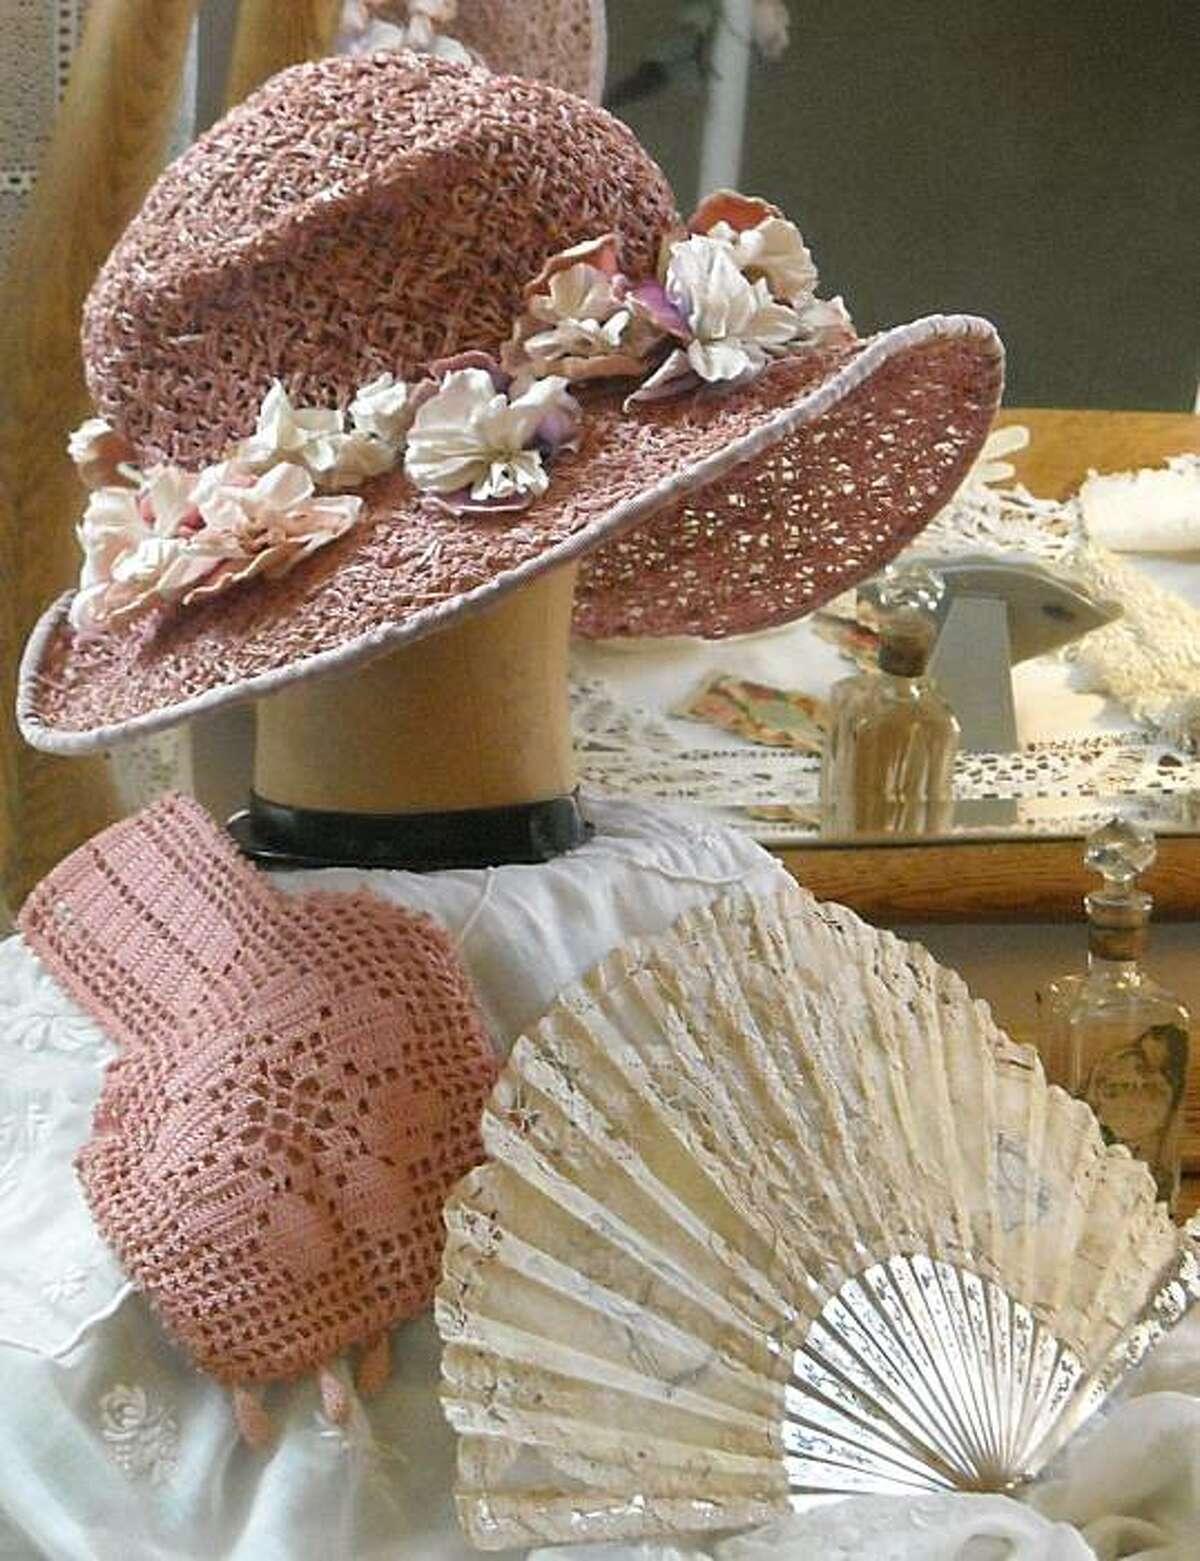 On display in the Victorian Ladies exhibit at Historic Deepwood Estate.